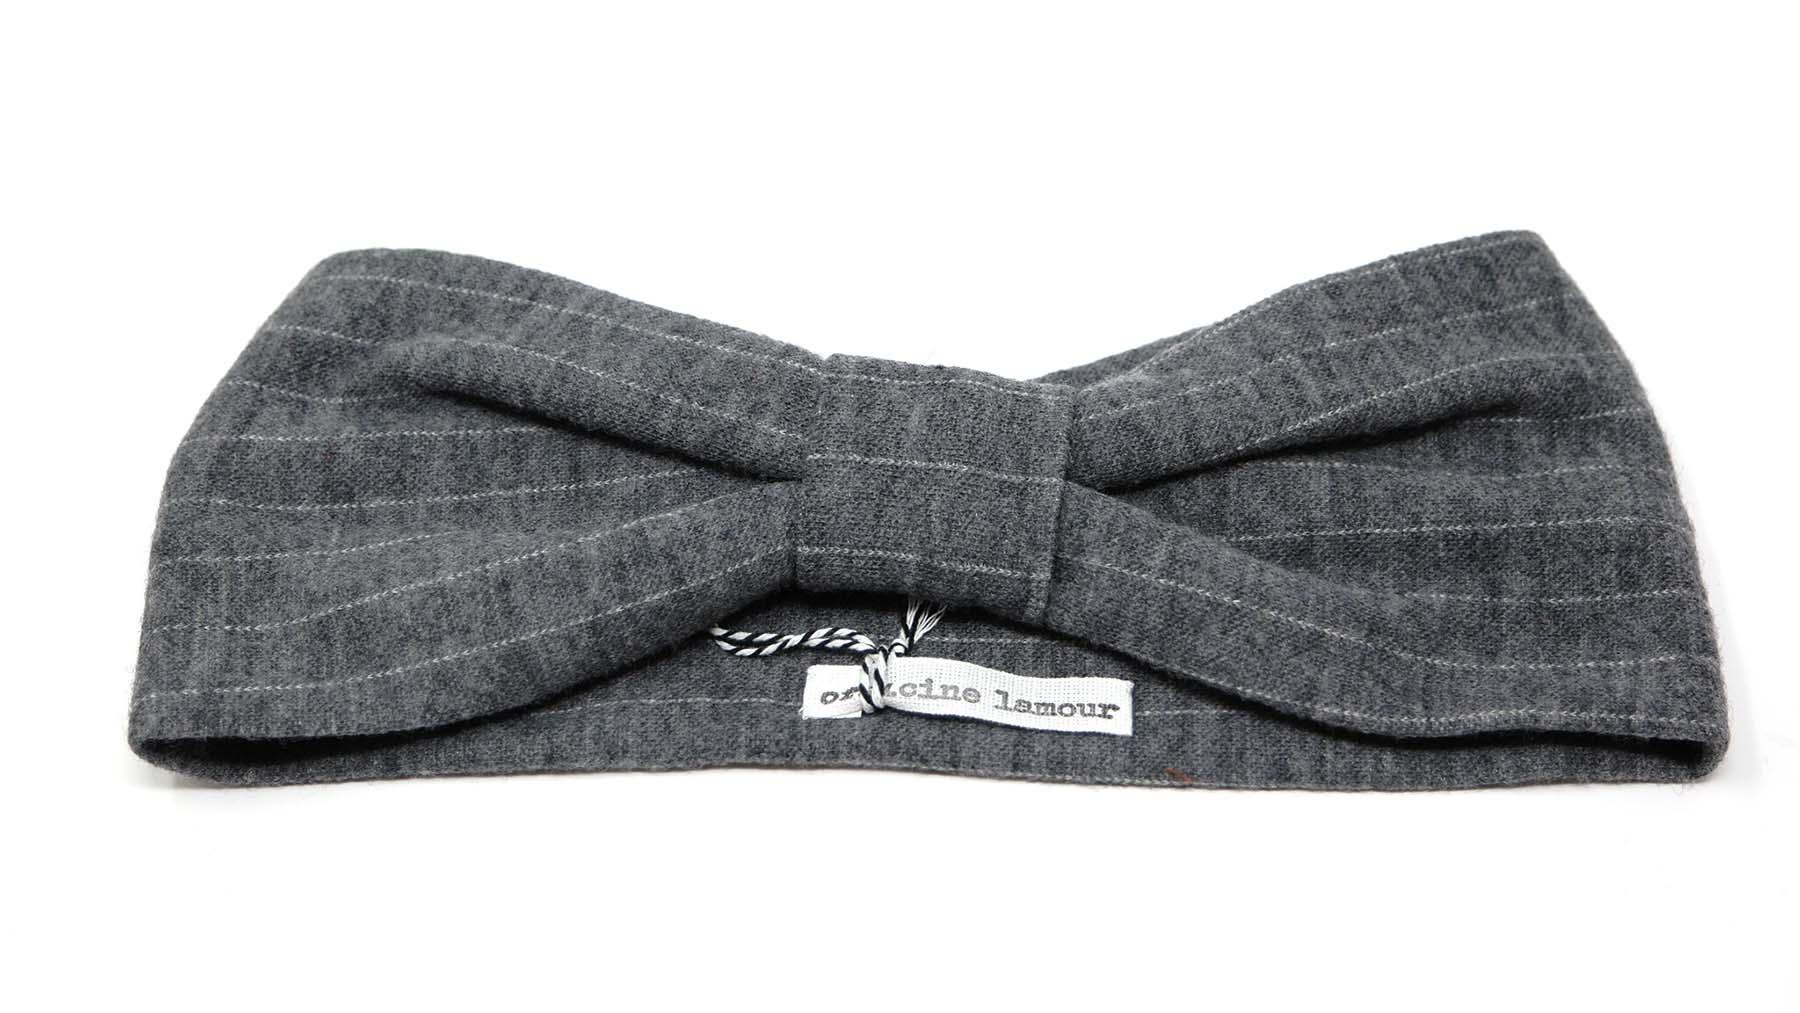 fascia capelli in lana fatta a mano udine